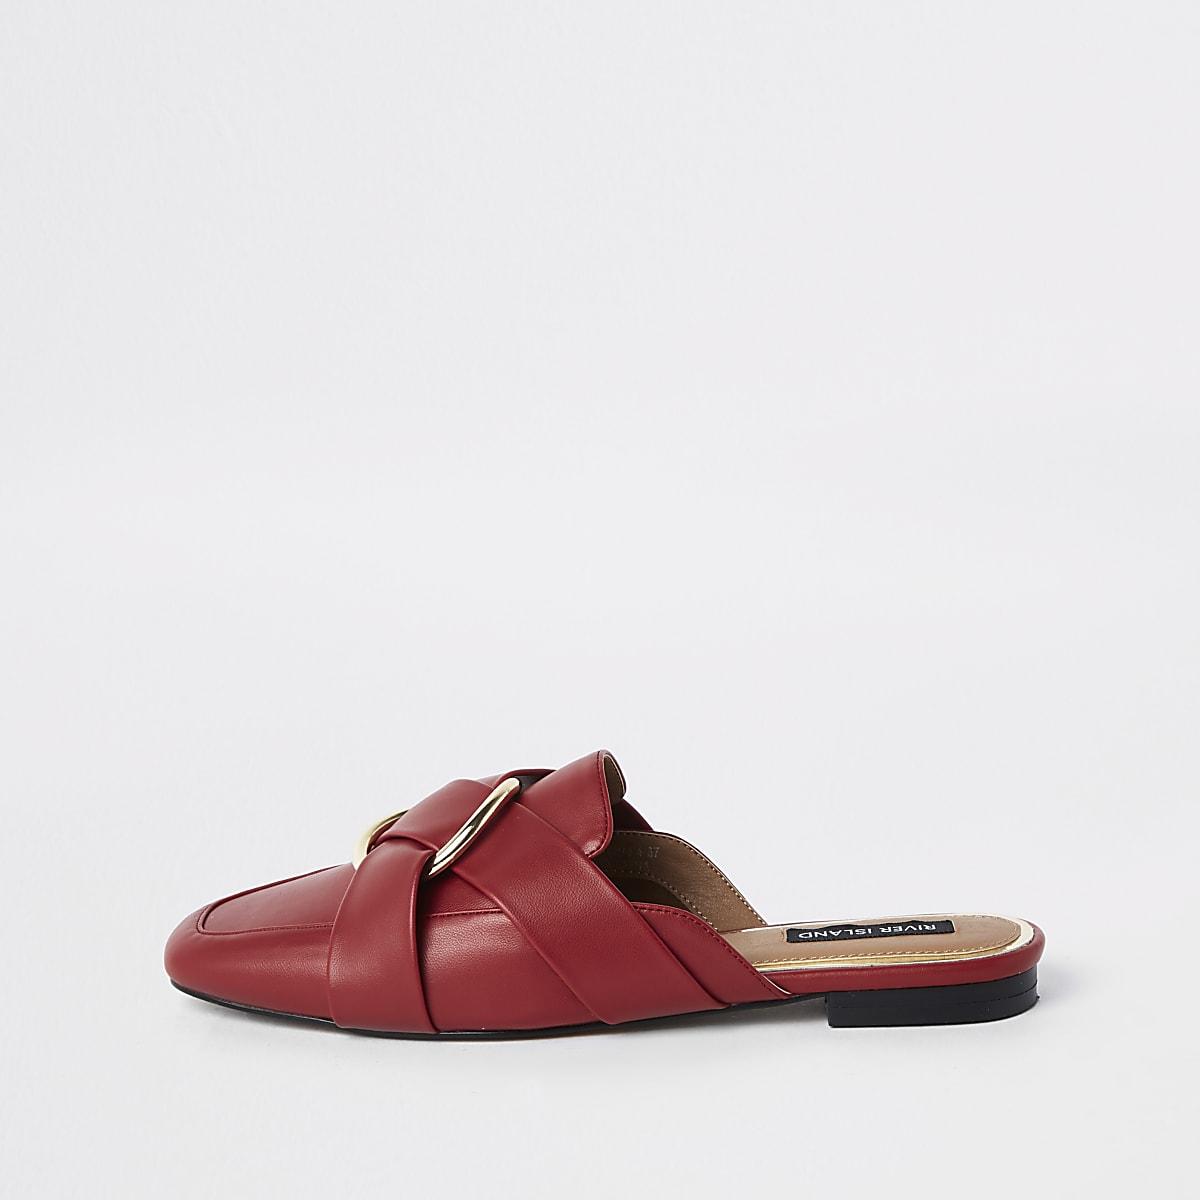 Rode hielloze loafers met ring